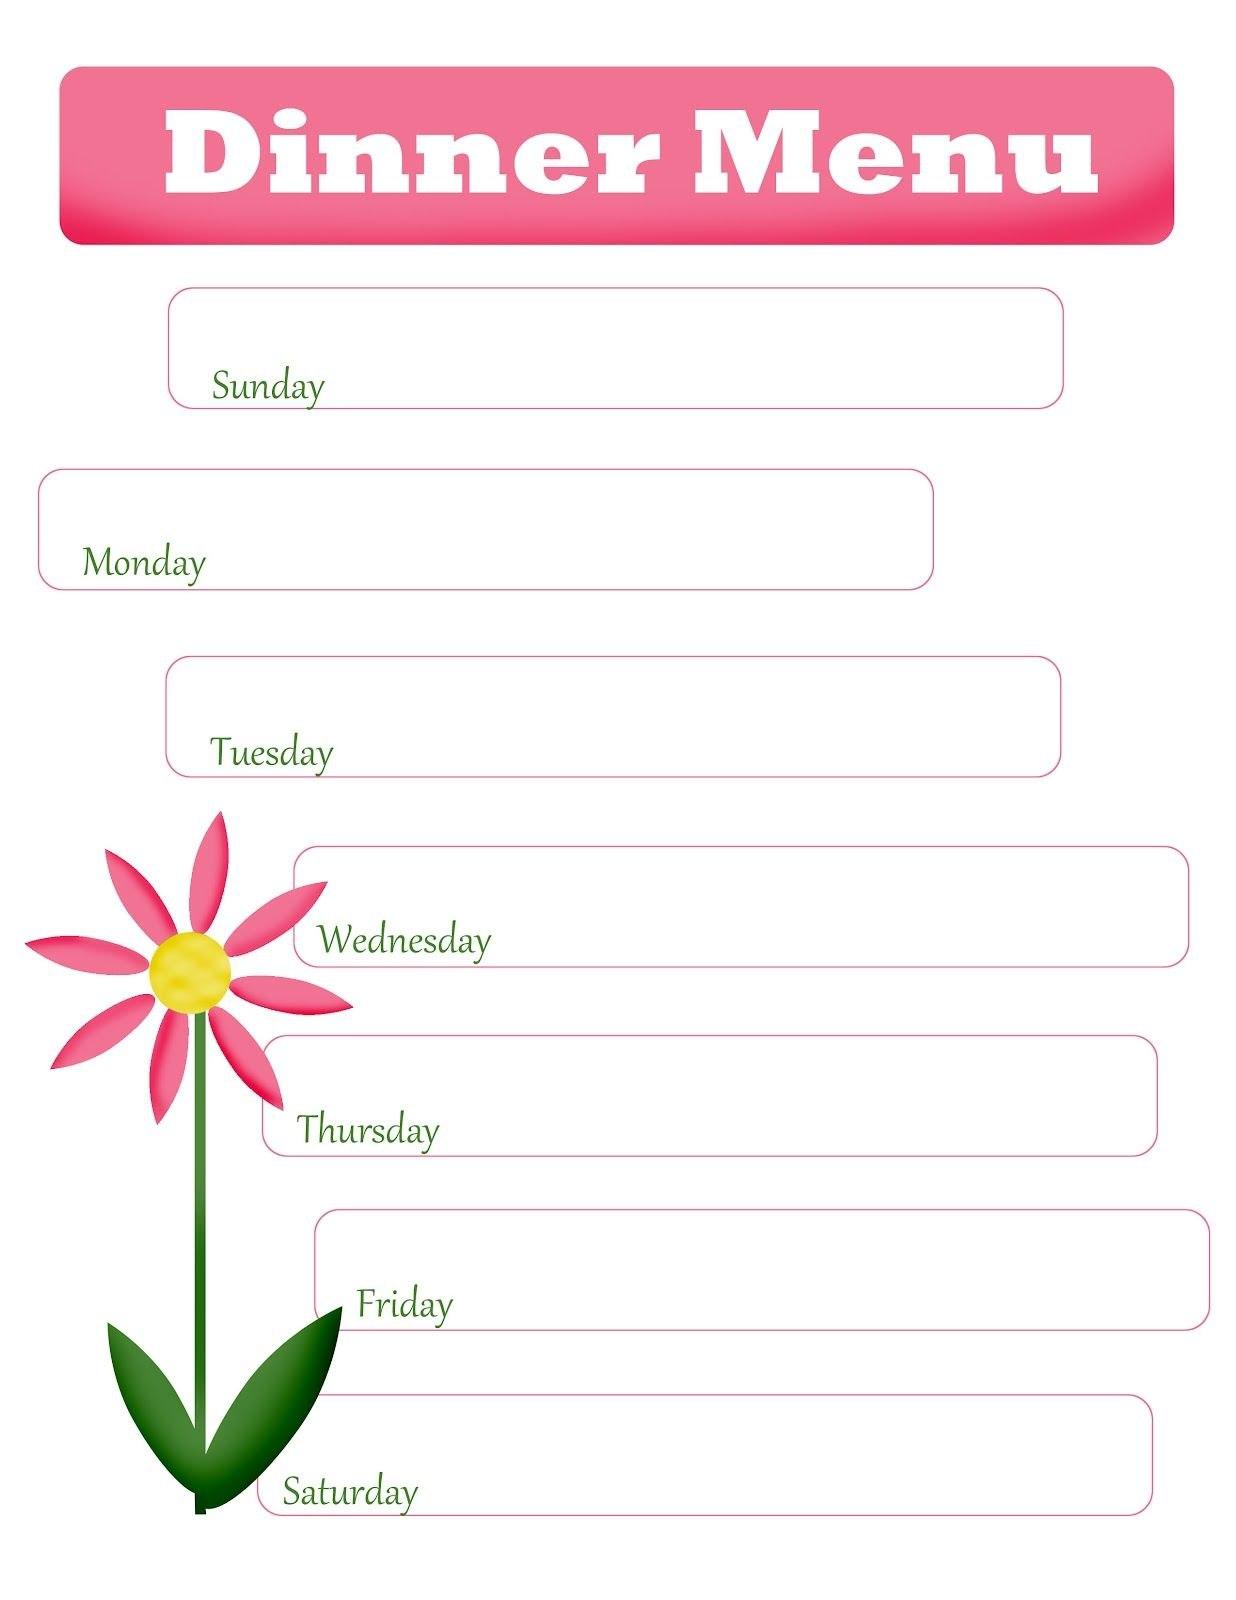 Mom's Menu Planning Free Printable Blank Dinner Menu  Spring With Regard To Menu Template Free Printable